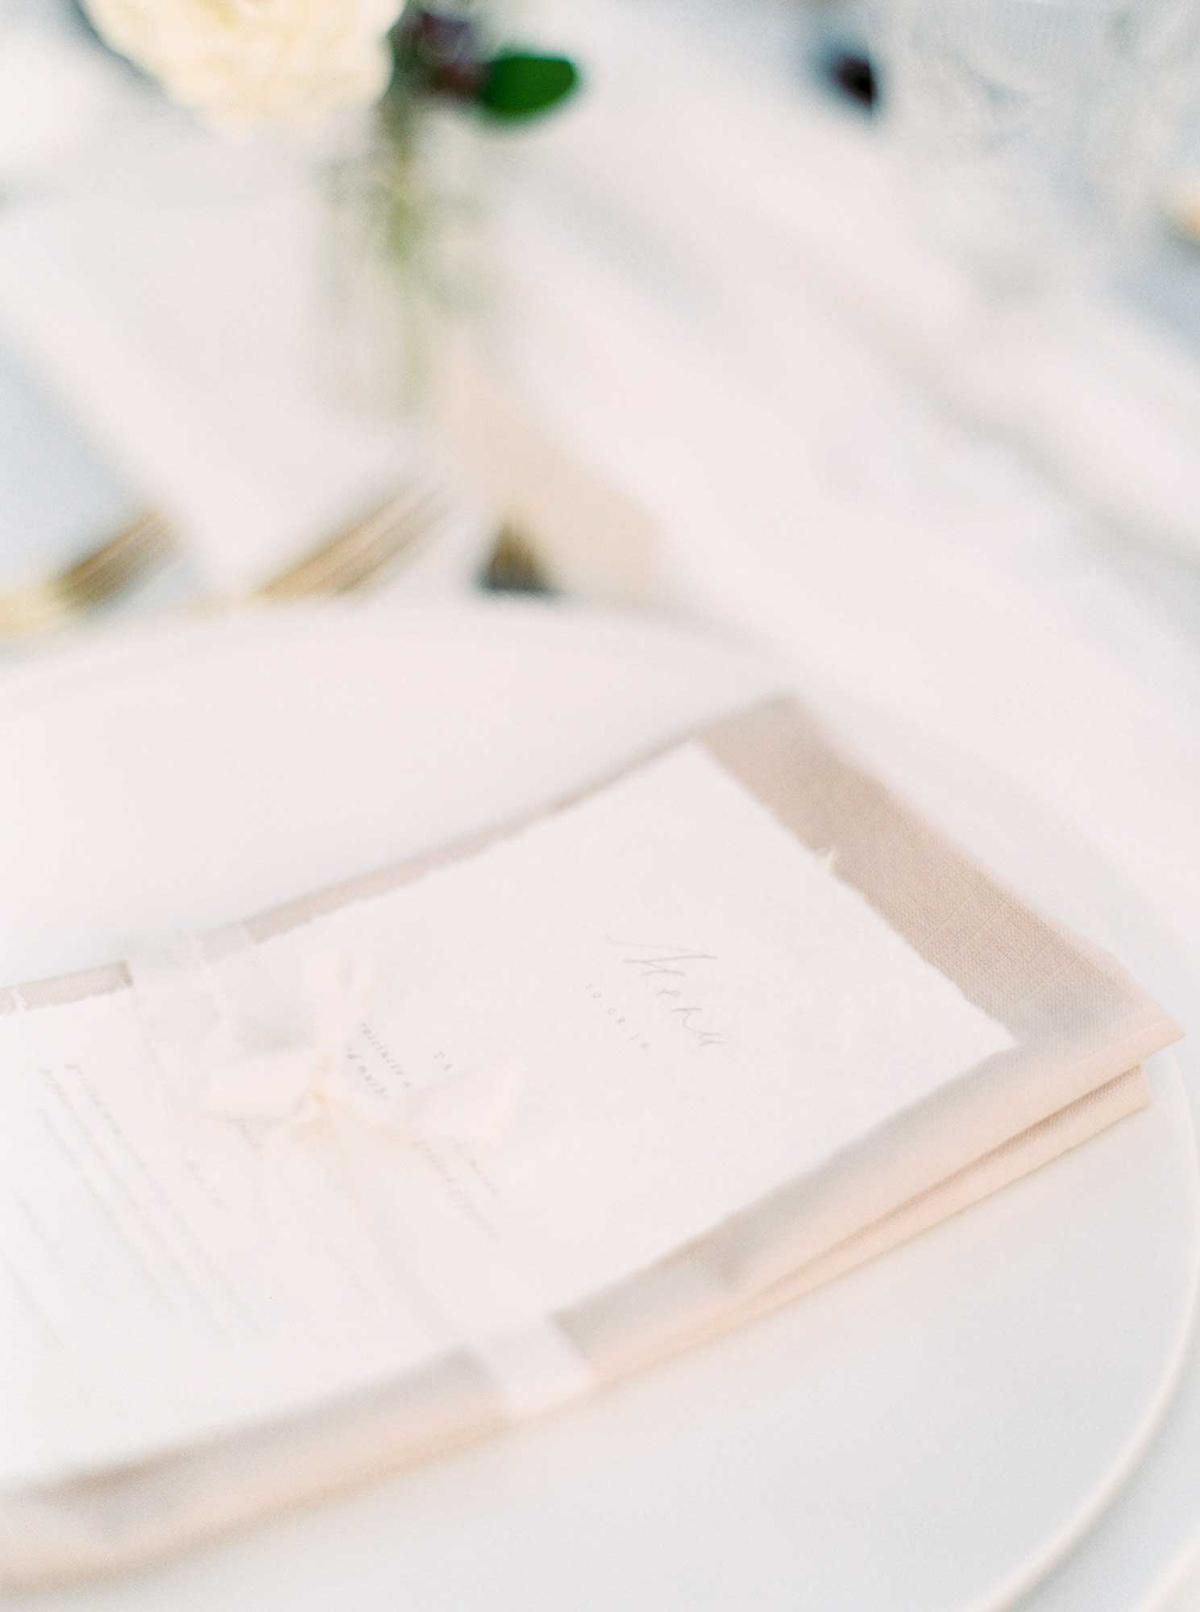 kayla-yestal-vineyard-bride-swish-list-woodland-weddings-niagara-wedding-editorial-69.jpg